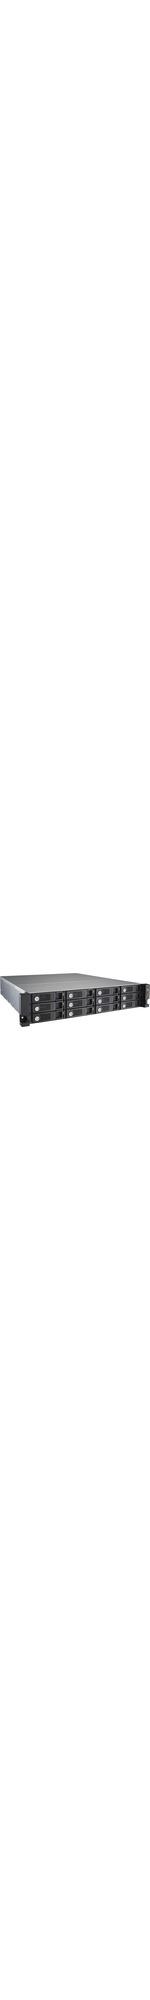 QNAP Turbo vNAS TVS-1271U-RP 12 x Total Bays SAN/NAS Server - 2U - Rack-mountable - Intel Core i7